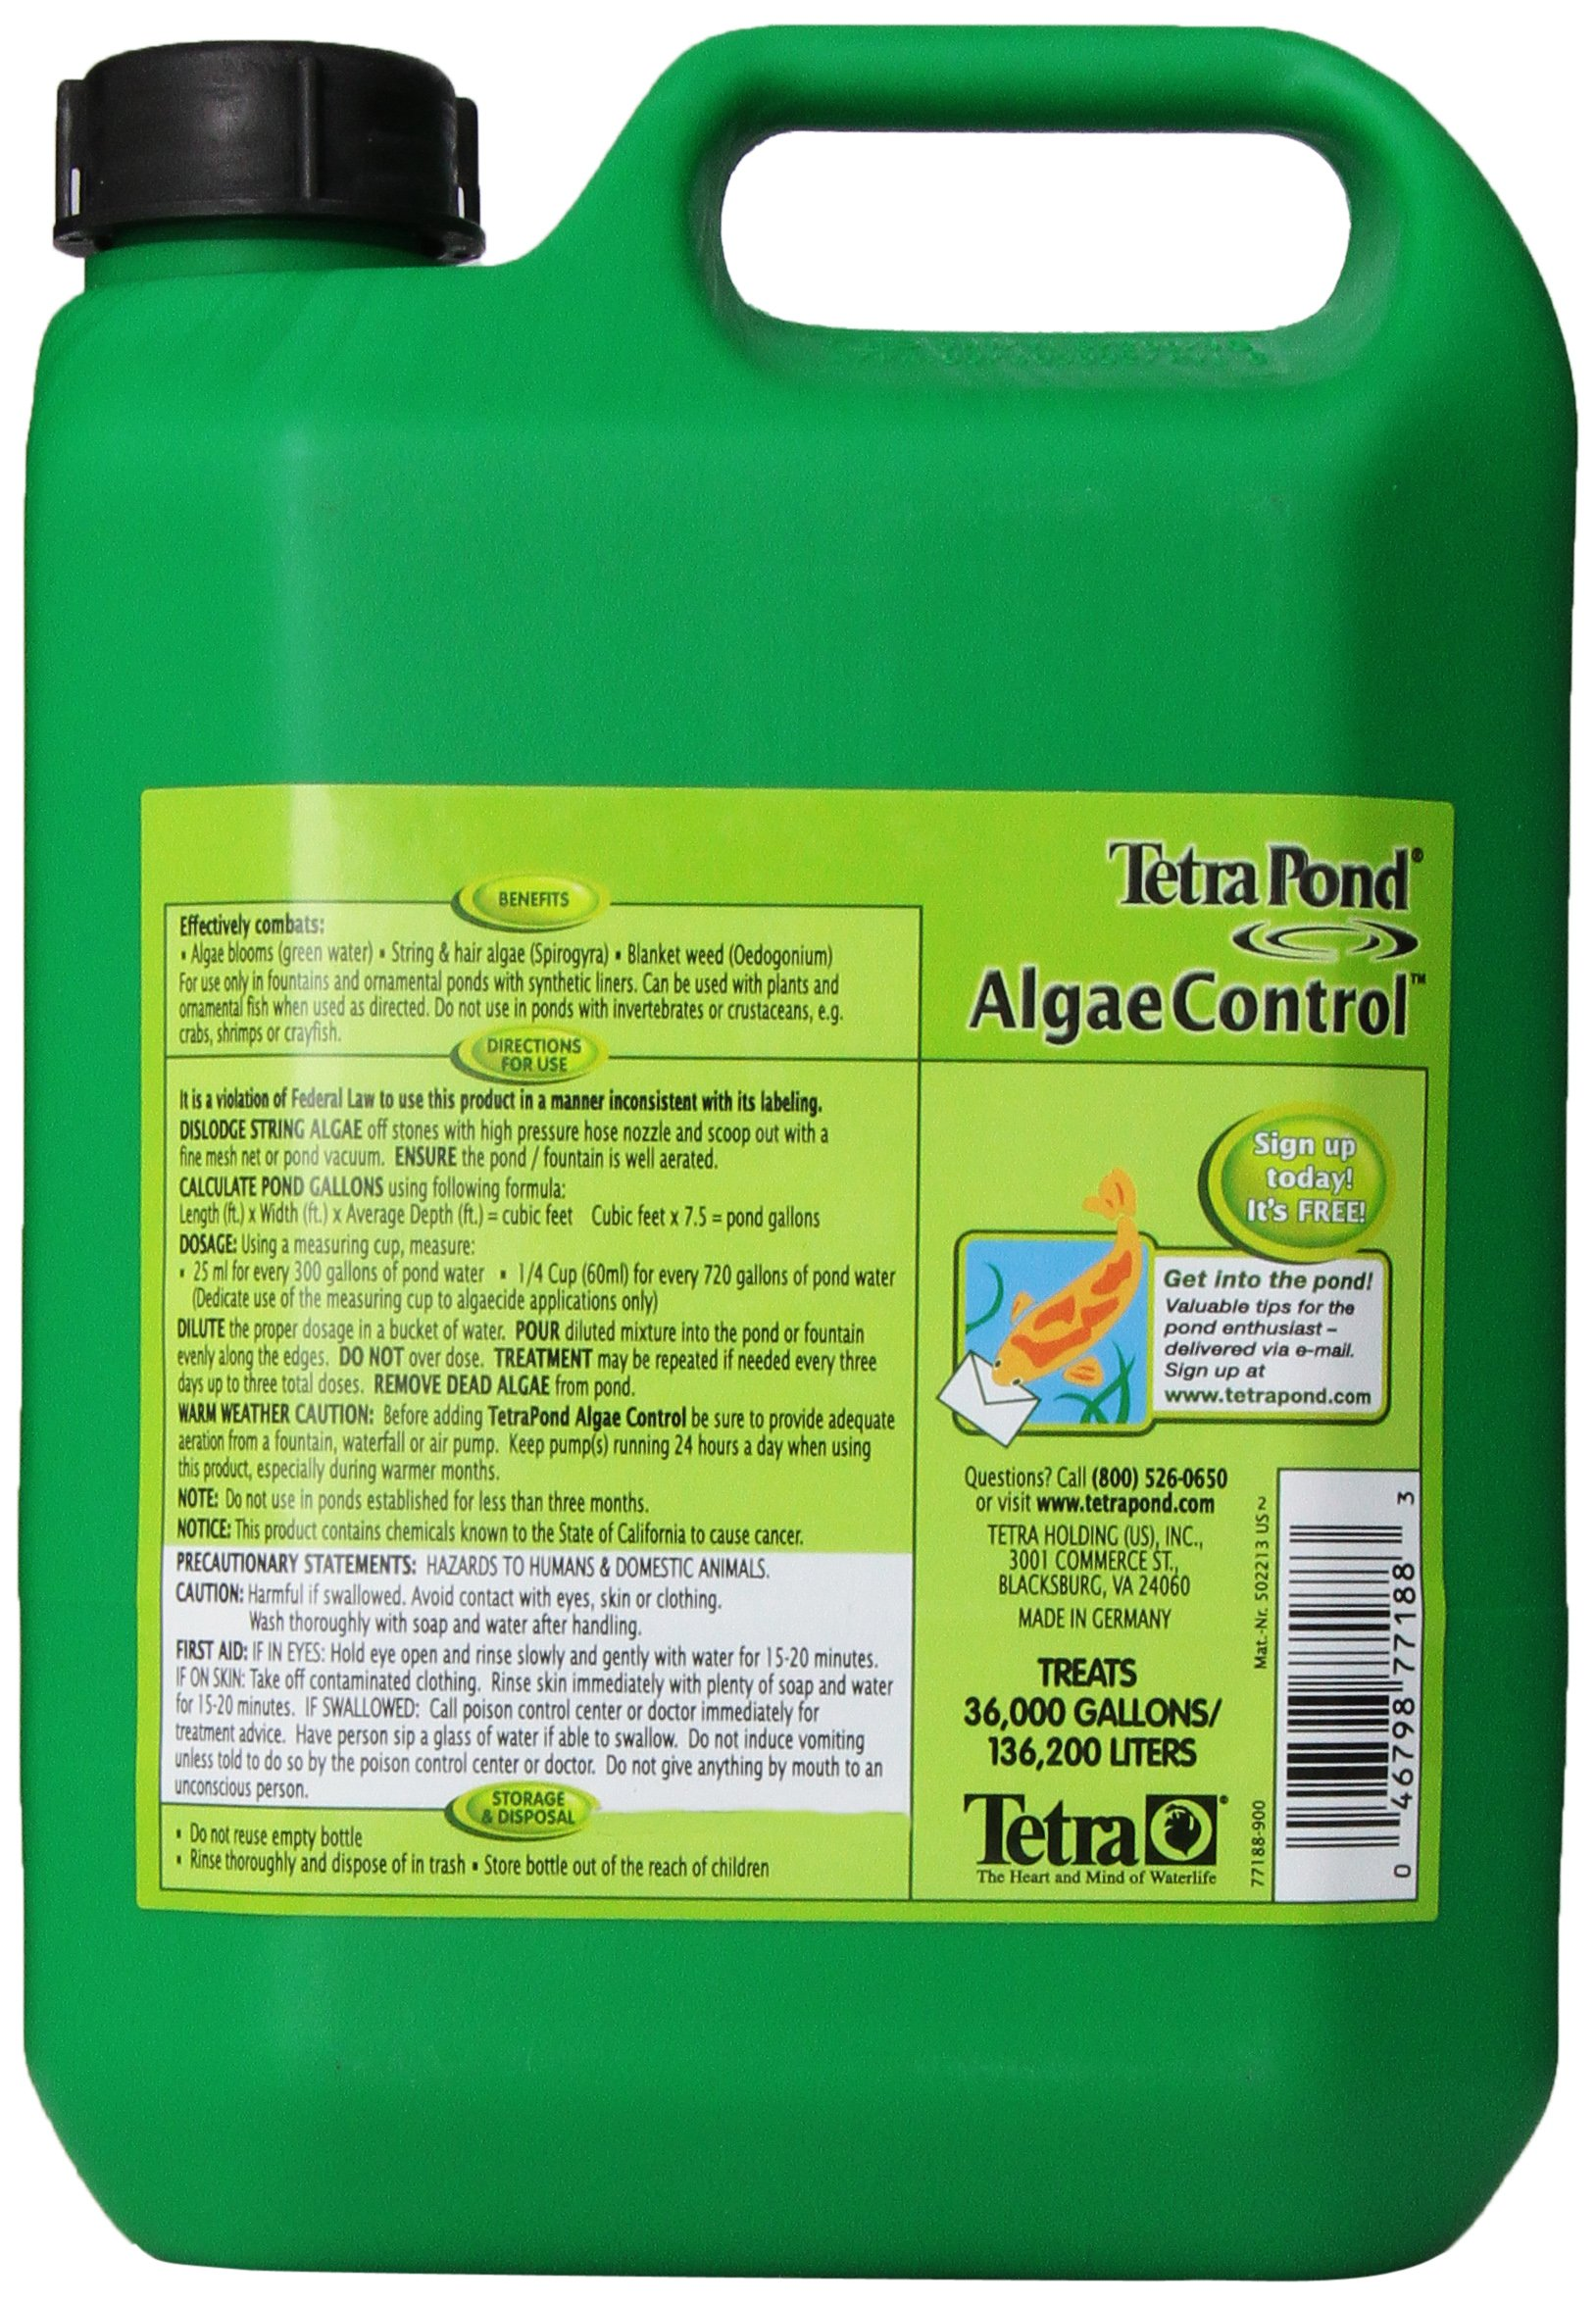 Tetra 77188 Algae Control Treats 36000 gallons, 101.4-Ounce by Tetra Pond